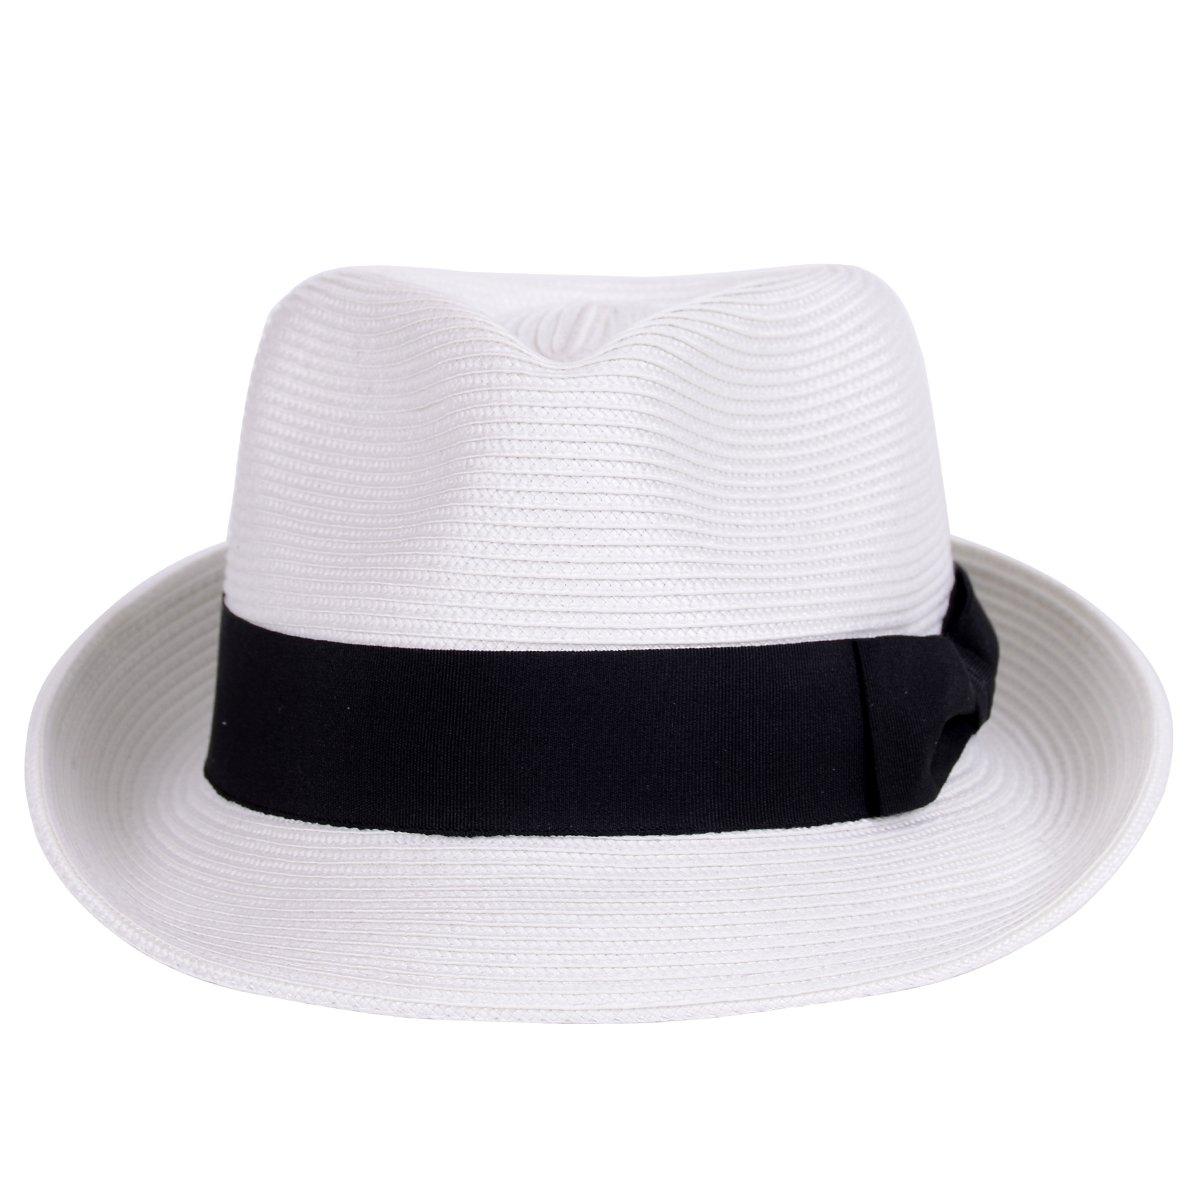 ac2957508f7 Straw fedora hat sun trilby unisex summer beach hats fashion panama jpg  1200x1200 White fedora